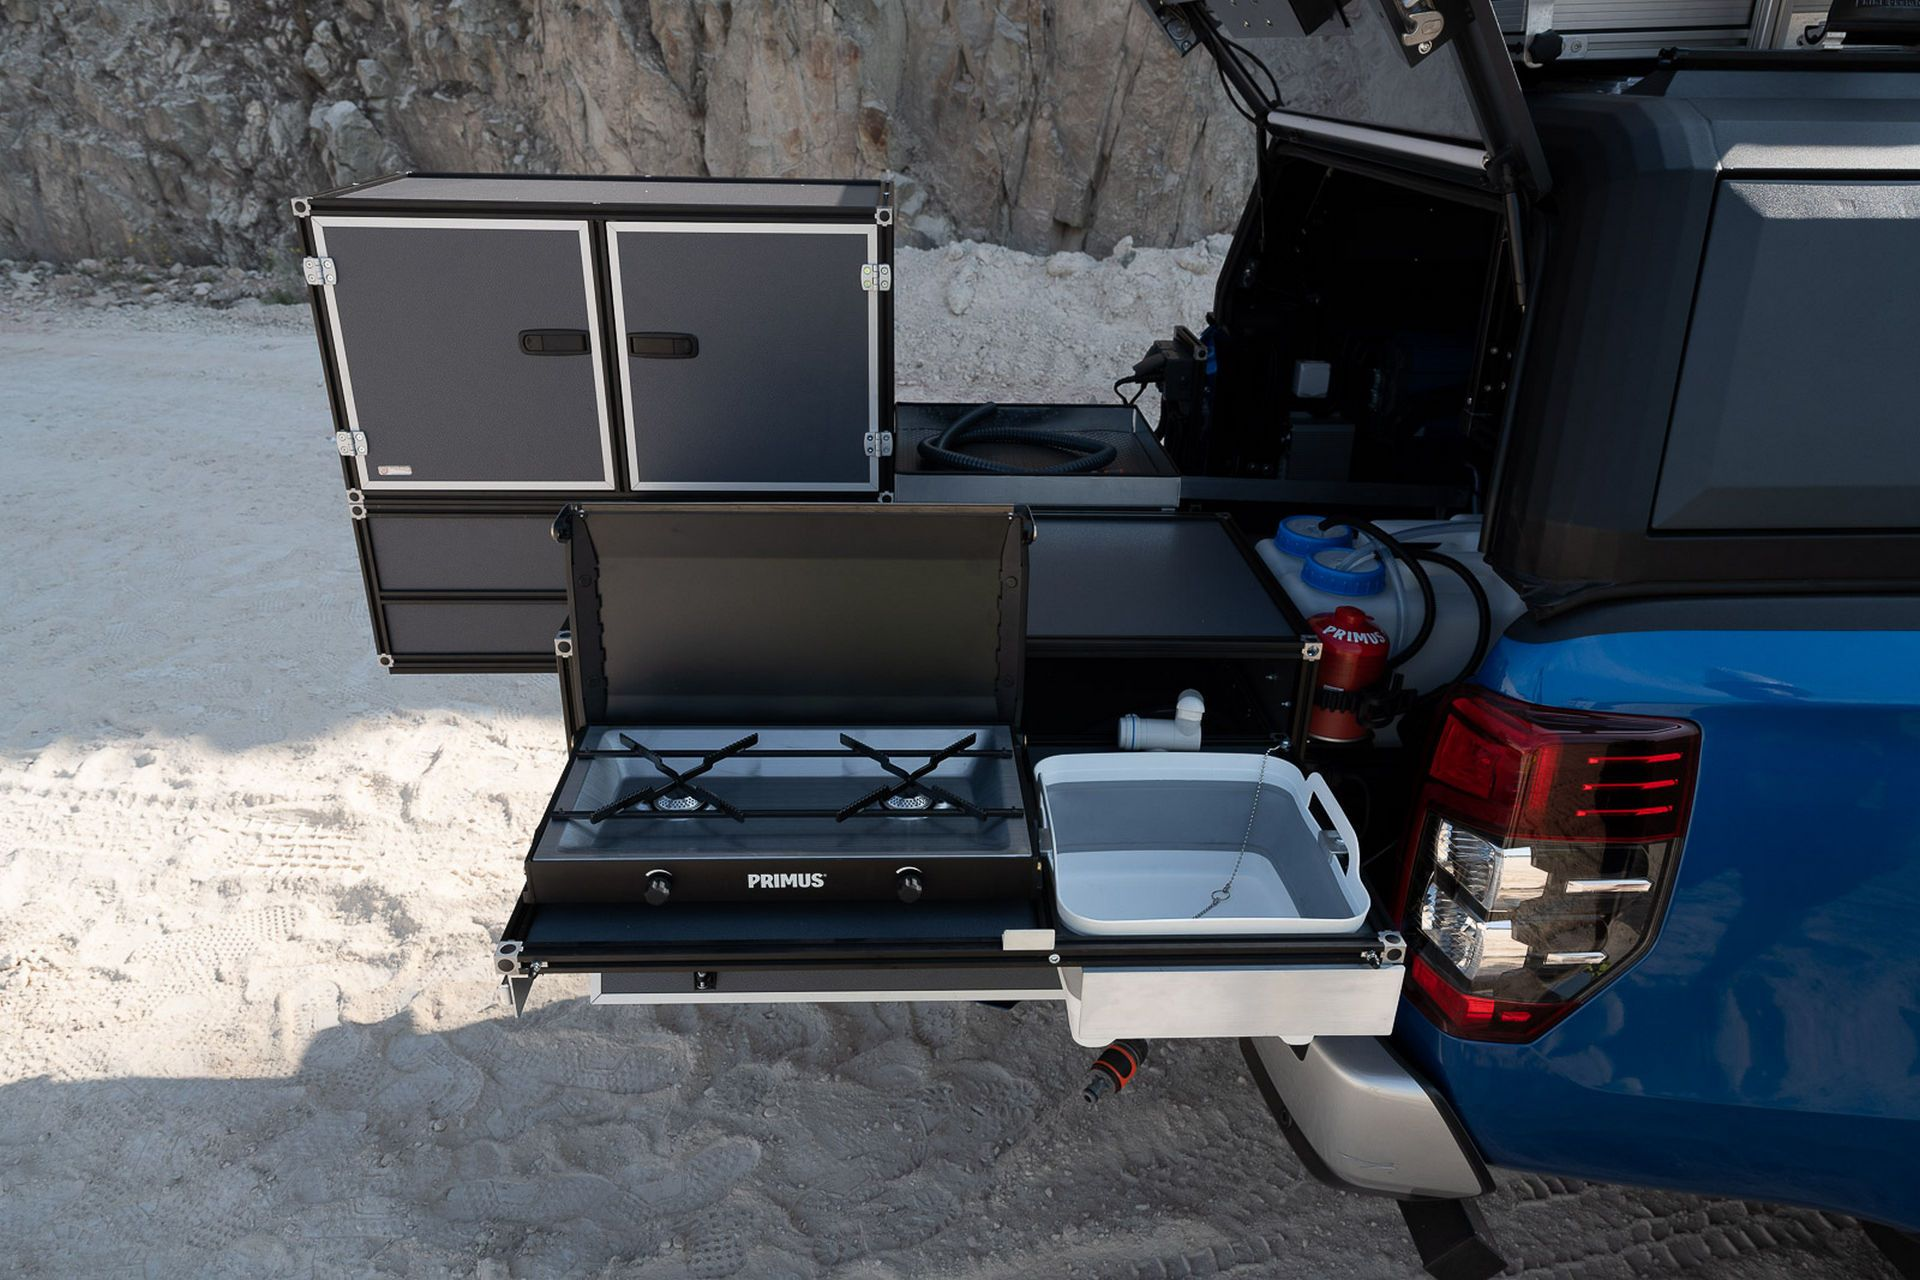 Mitsubishi-L200-Camping-Accessories-4